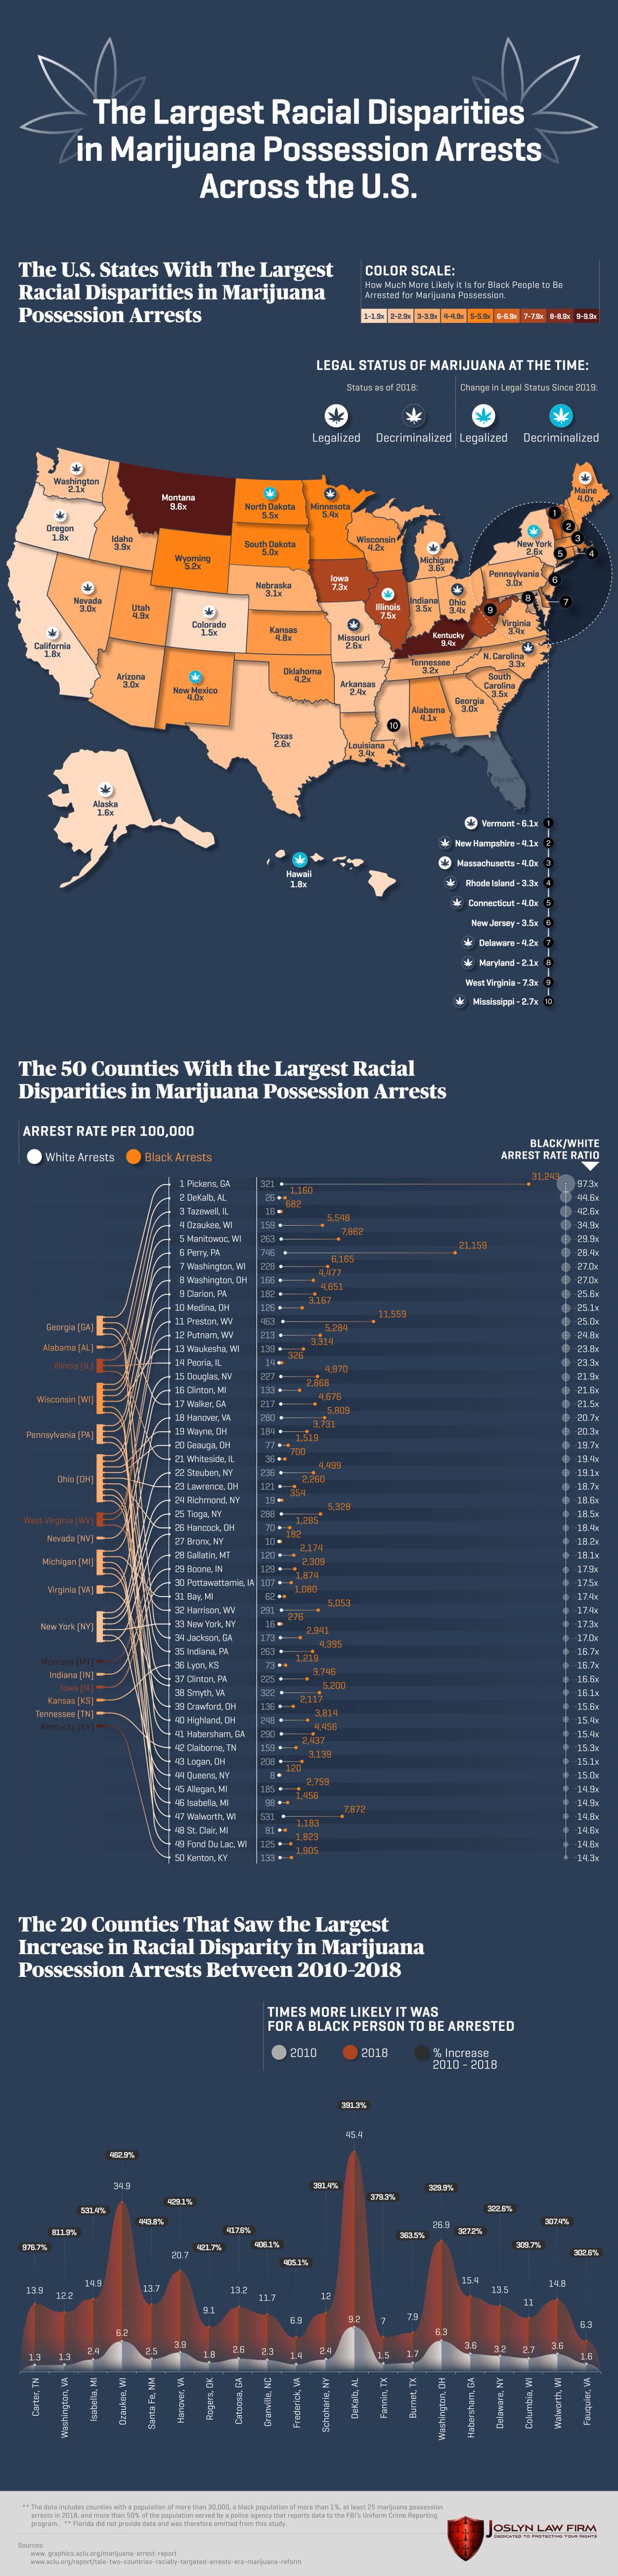 The Largest Racial Disparities in Marijuana Possession Arrests Across the U.S.